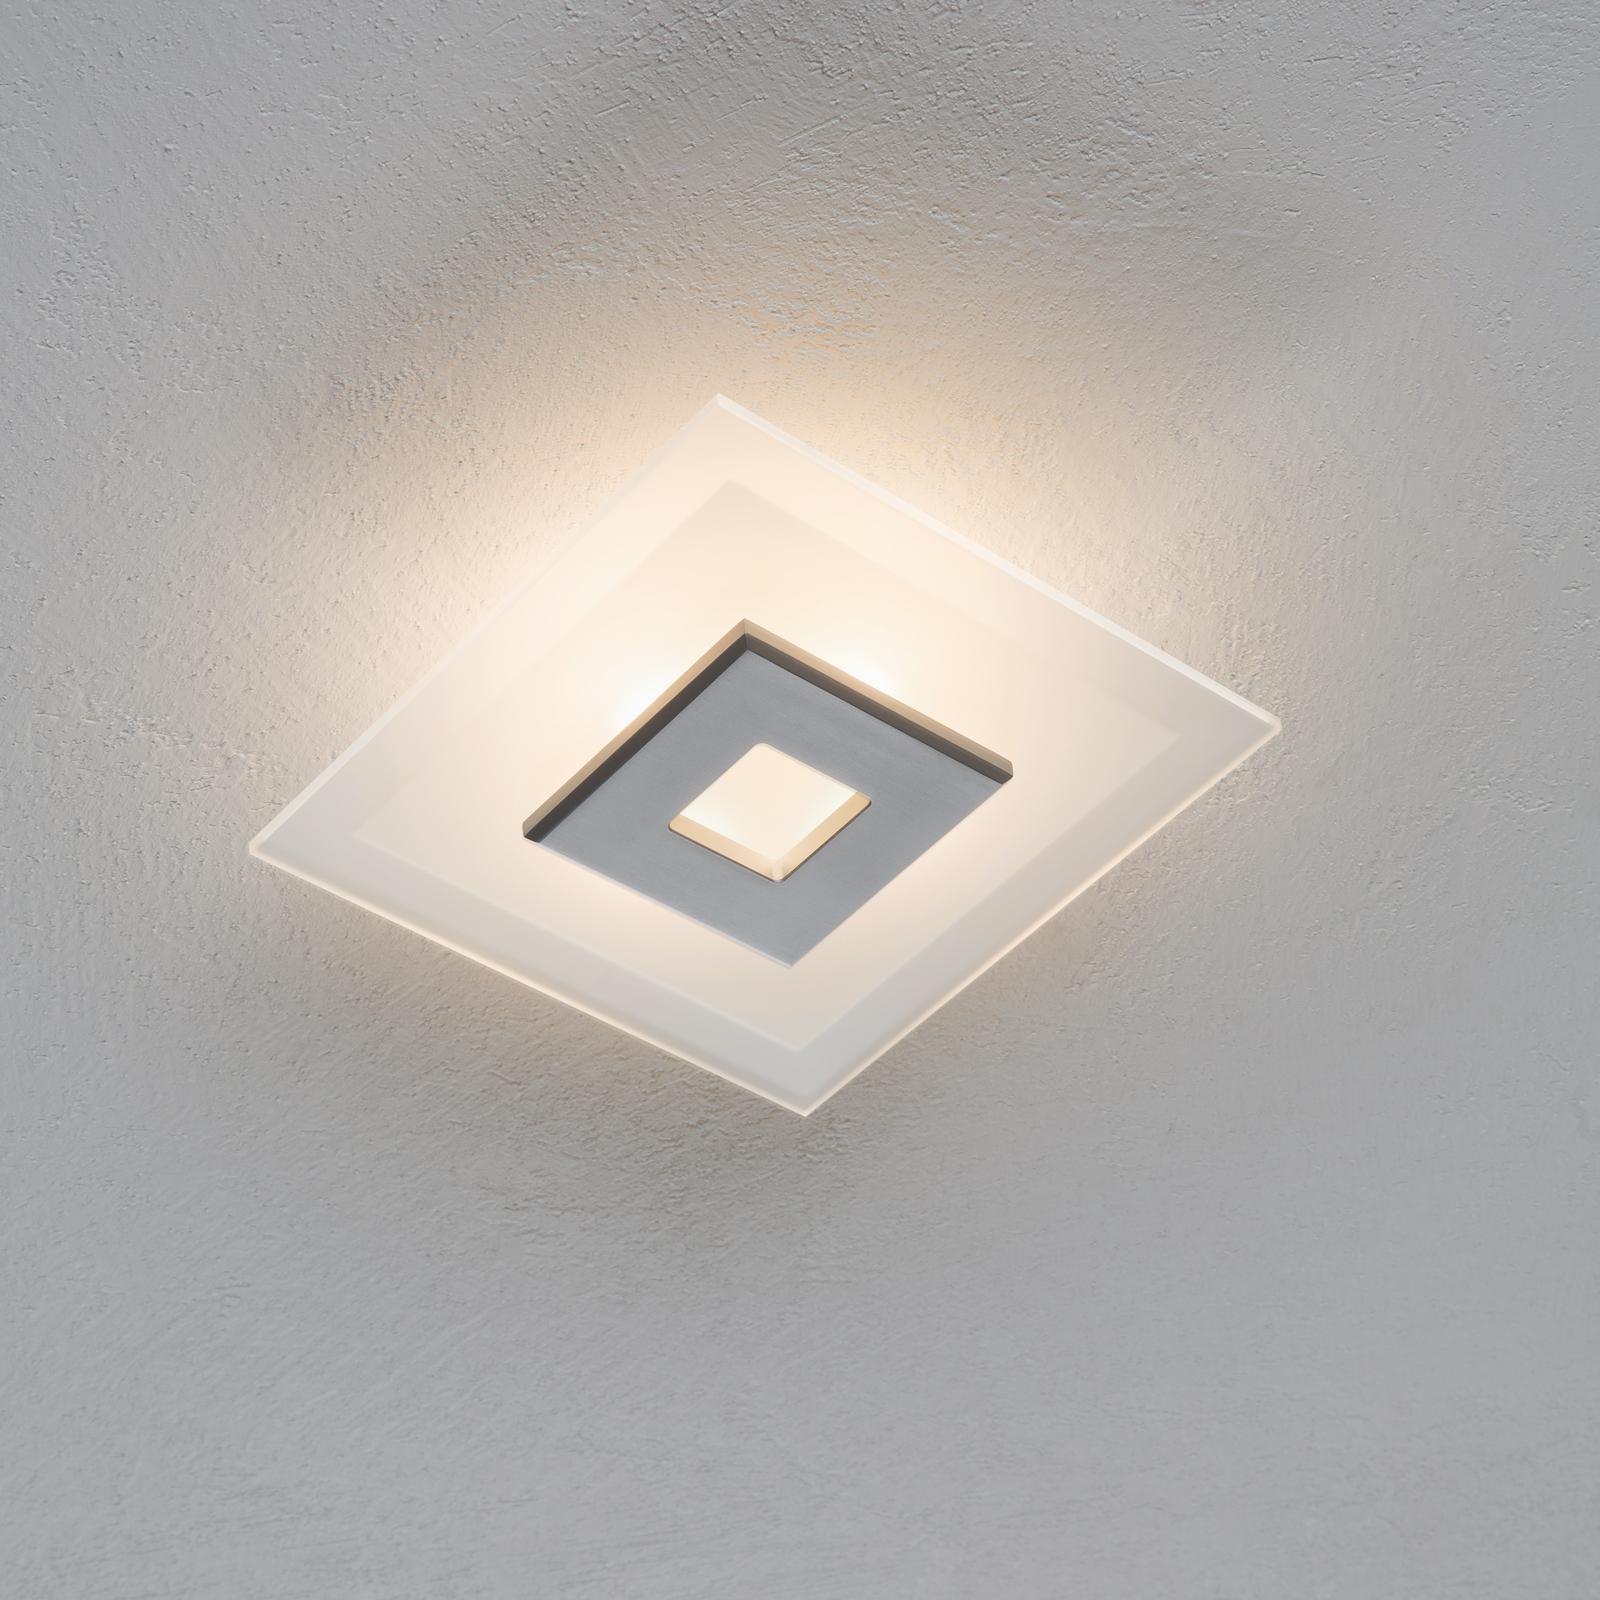 LED-kattovalaisin Tian, lasivarjostin, 25 cm